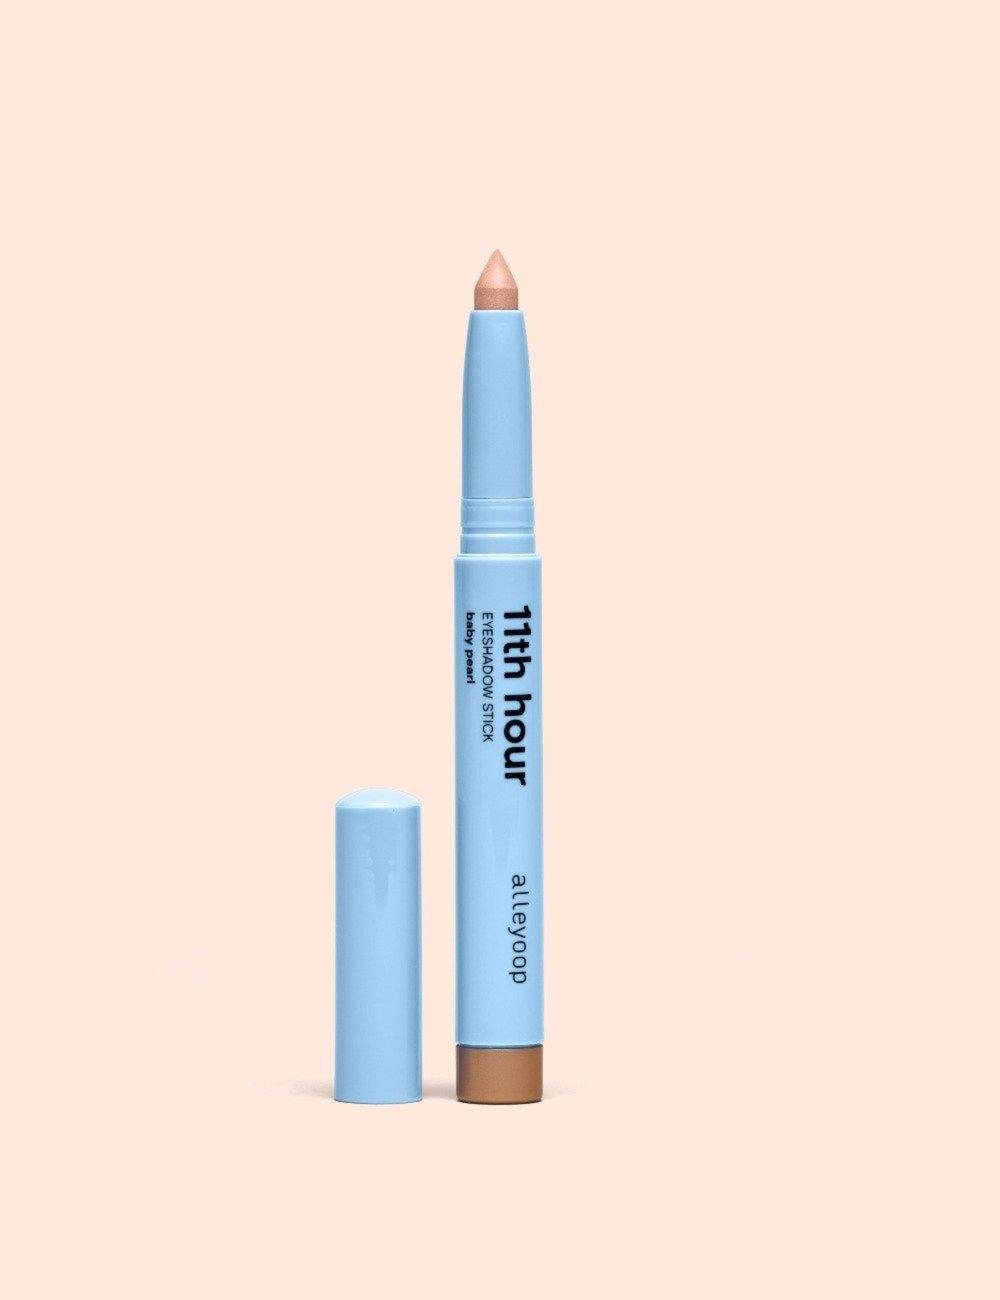 cream eyeshadow stick